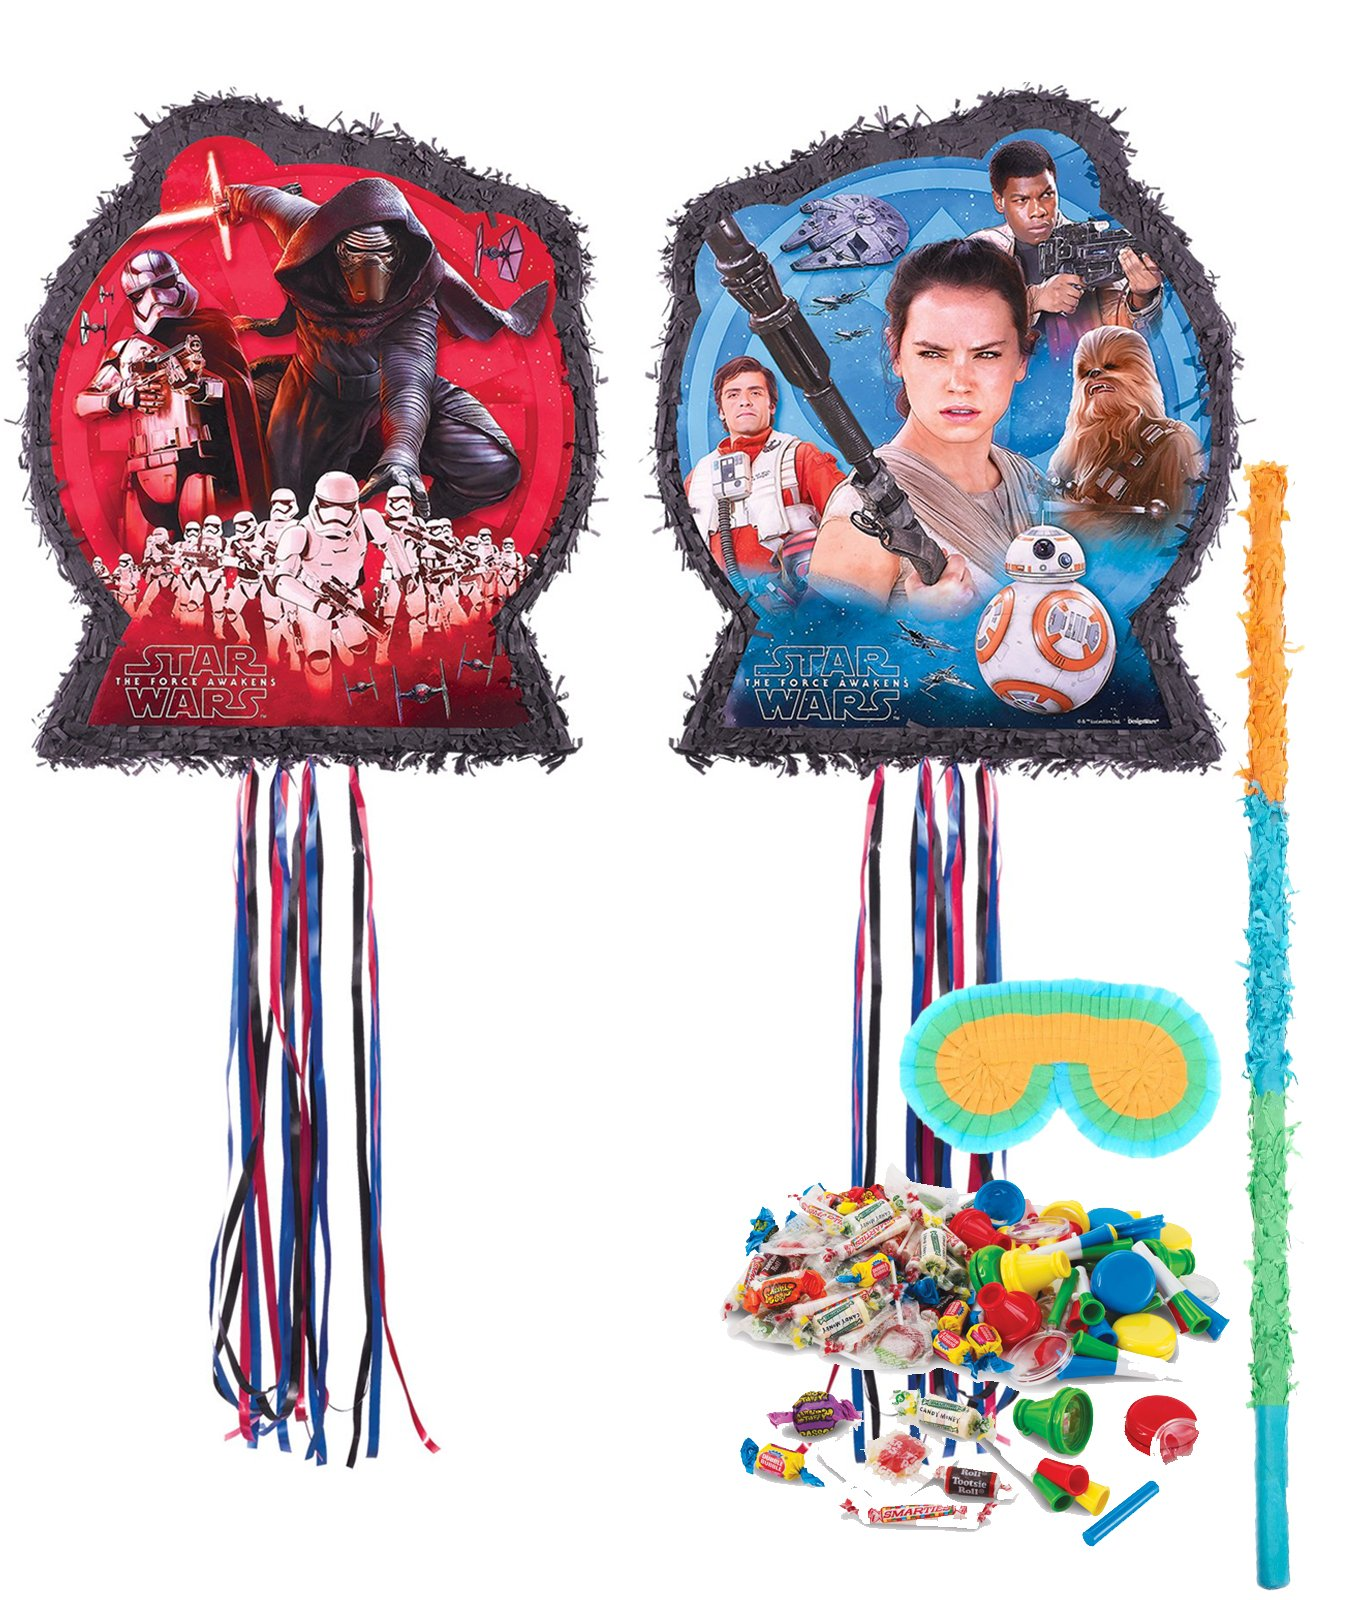 BirthdayExpress Star Wars The Force Awakens Party Supplies - Pinata Kit by BirthdayExpress